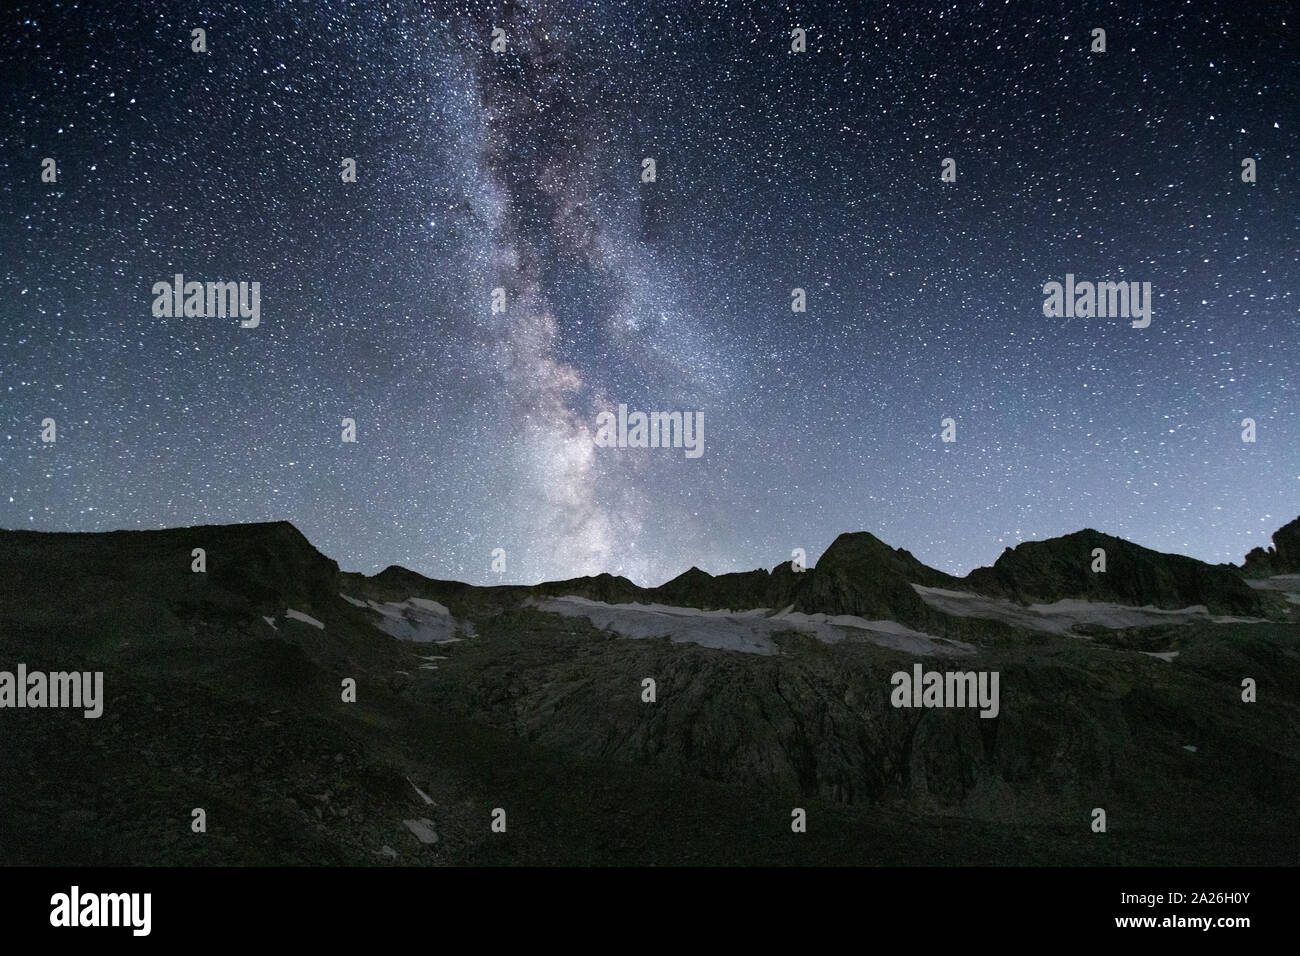 Milky Way and starry sky. Night landscape. Rainbachtal valley. Rainbach-Schwarzkopf peaks.  Zillertaler Alps. Hohe Tauern National Park. Austrian Alps. Stock Photo